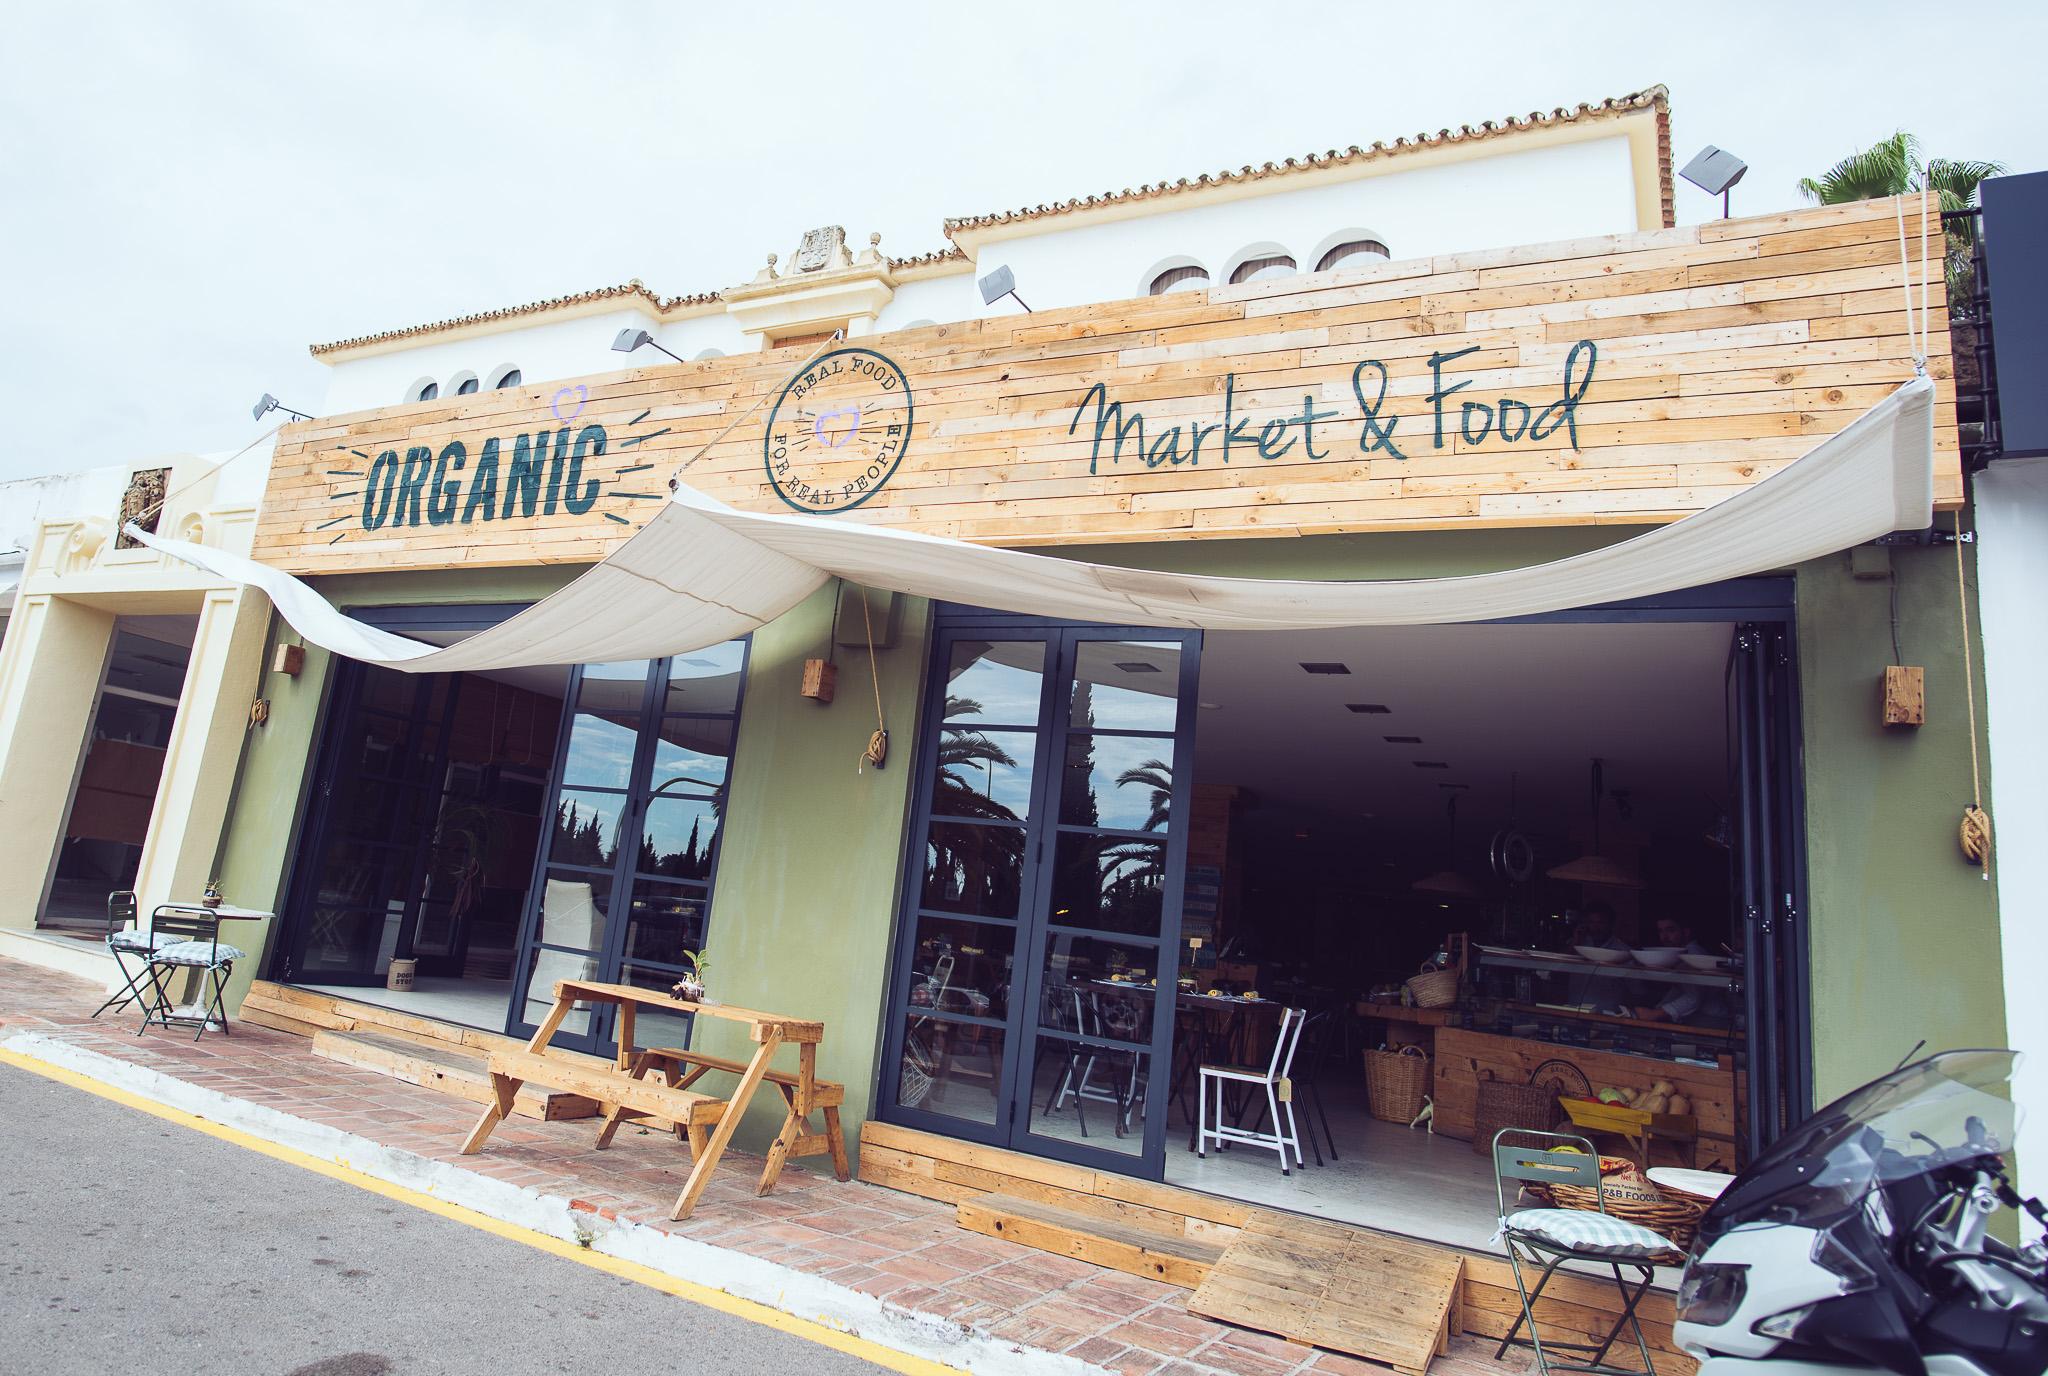 Organic Marbella